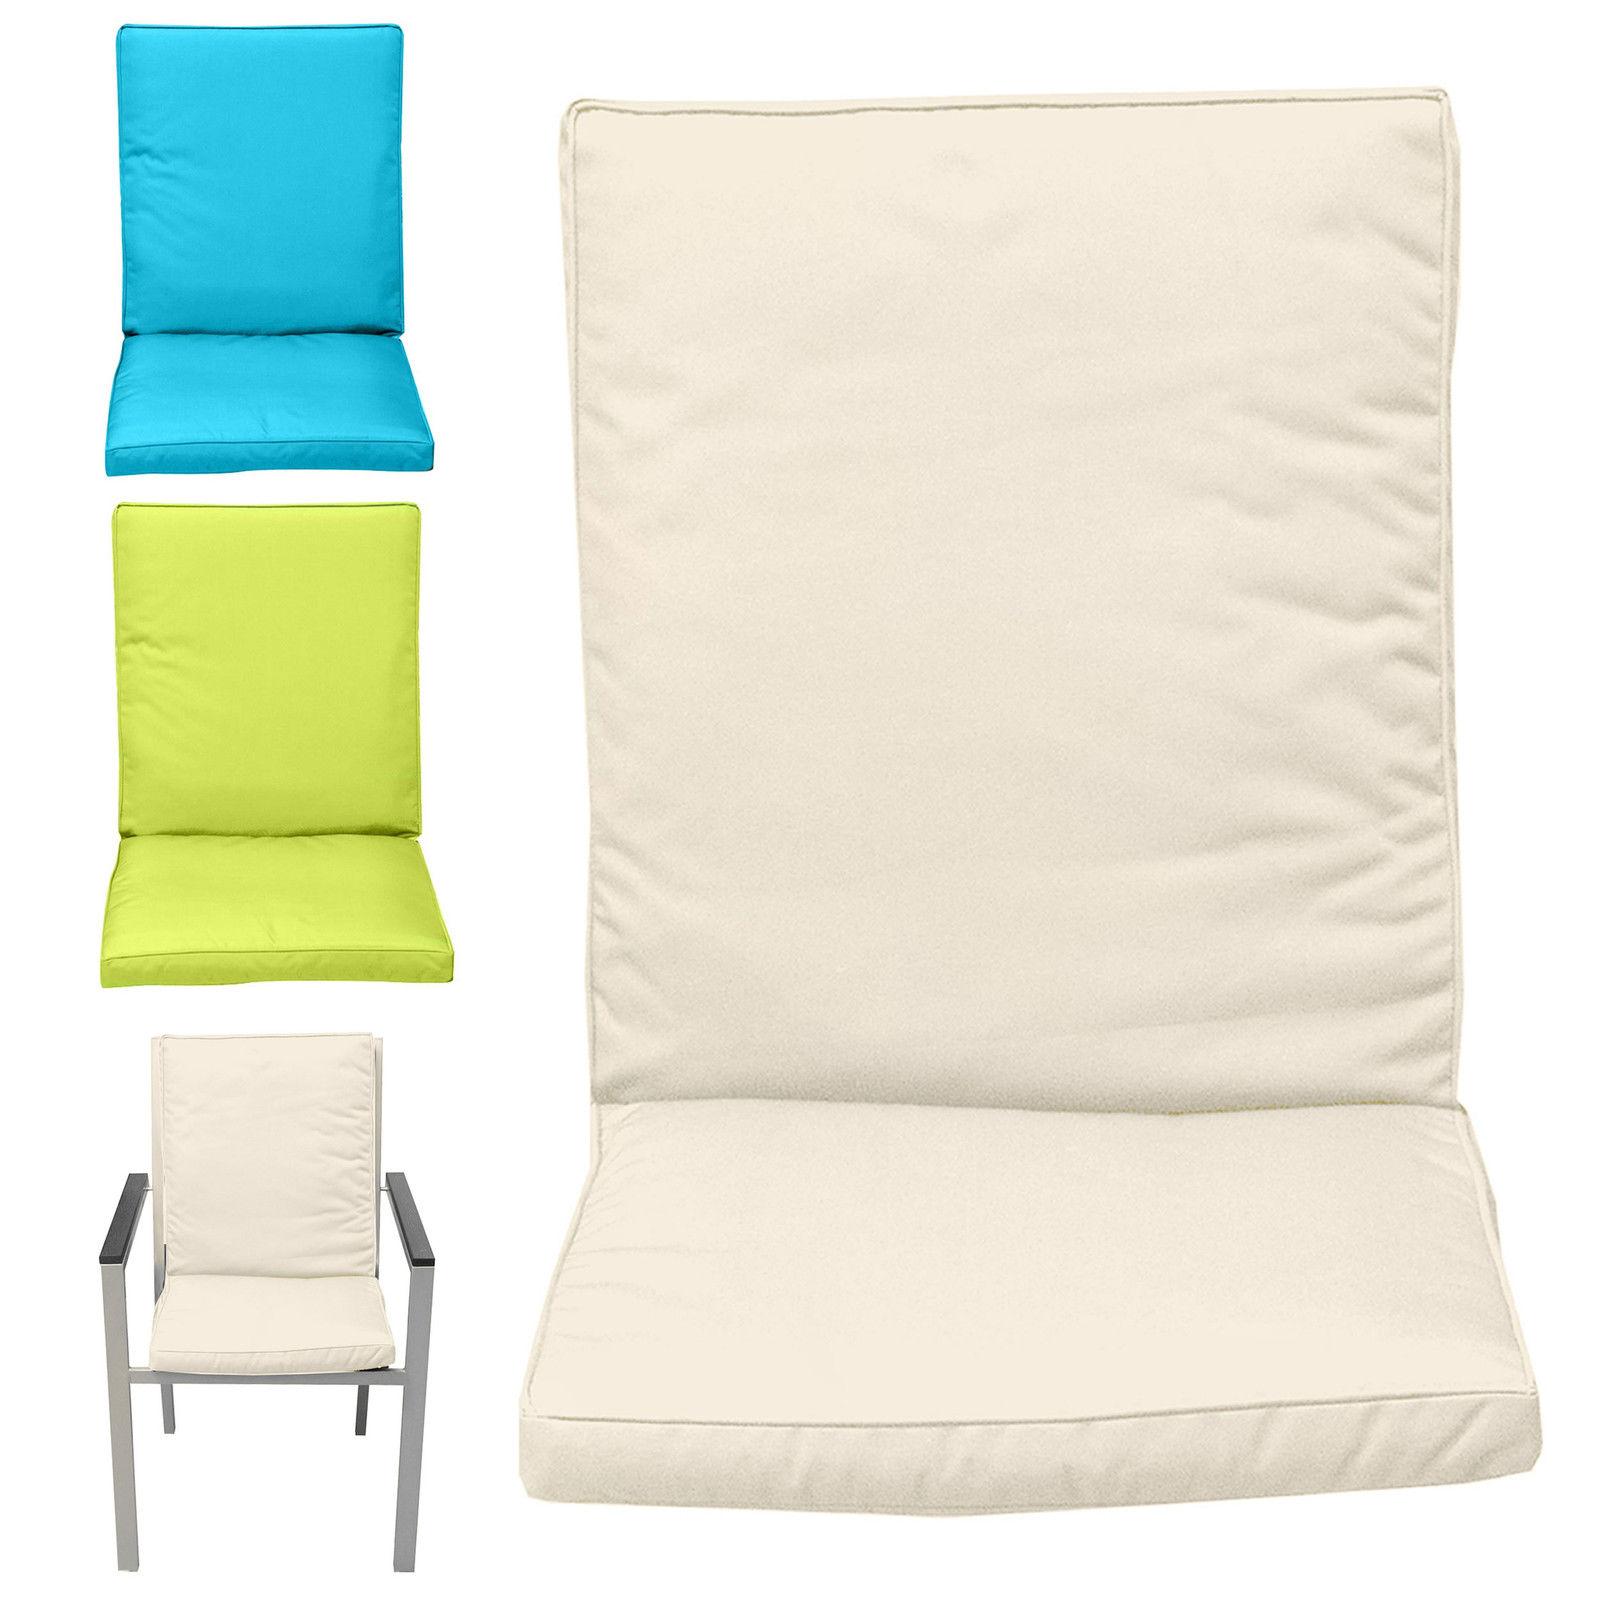 Garden Kitchen chair Seat Furniture Waterproof Foam Cover